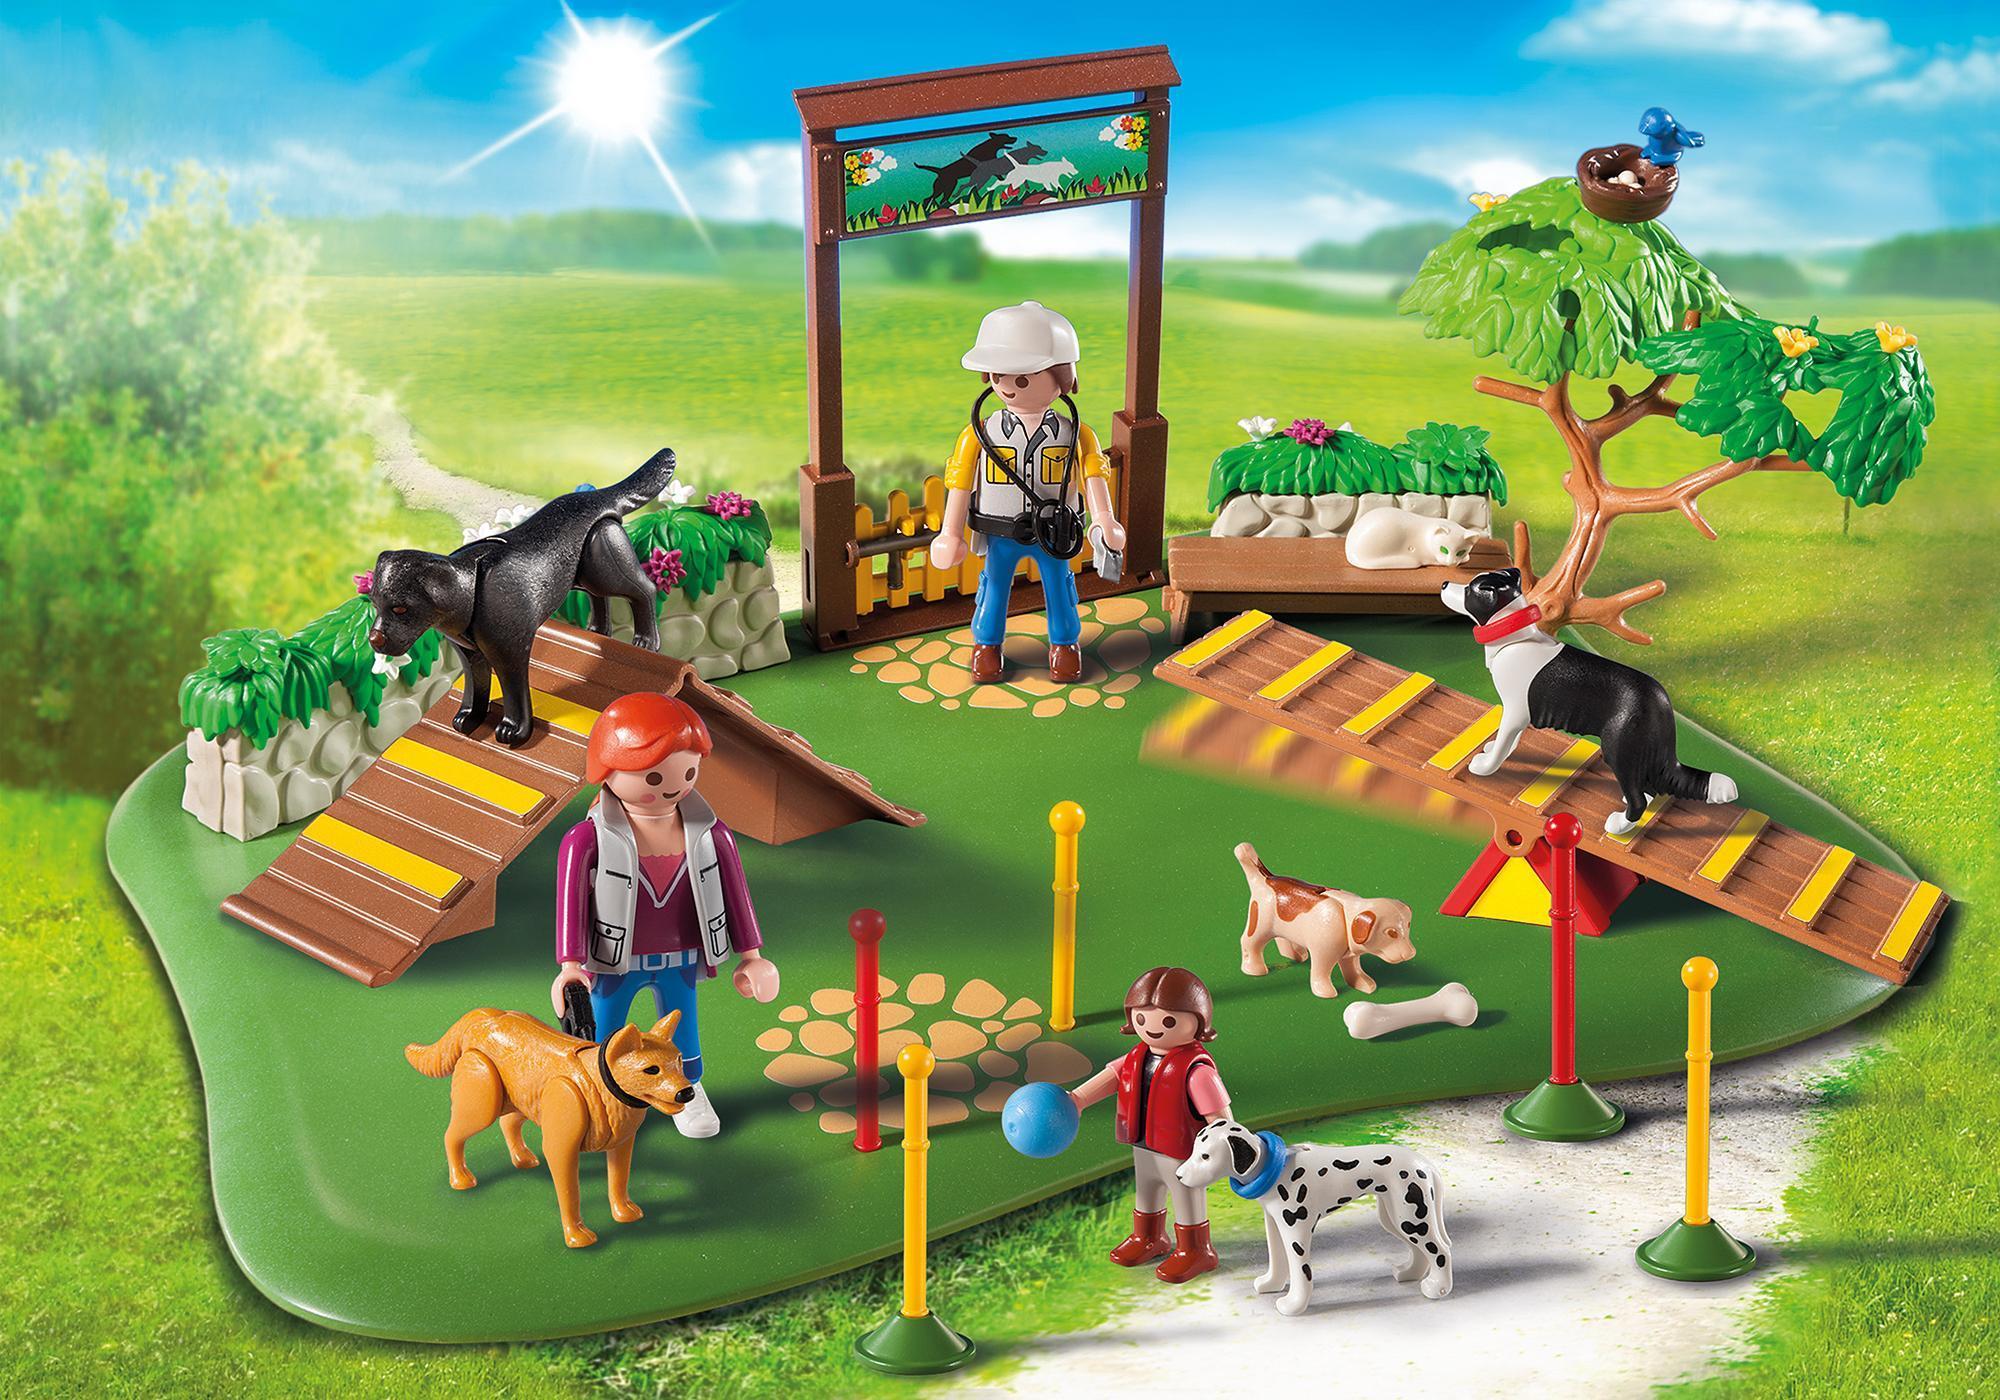 http://media.playmobil.com/i/playmobil/6145_product_detail